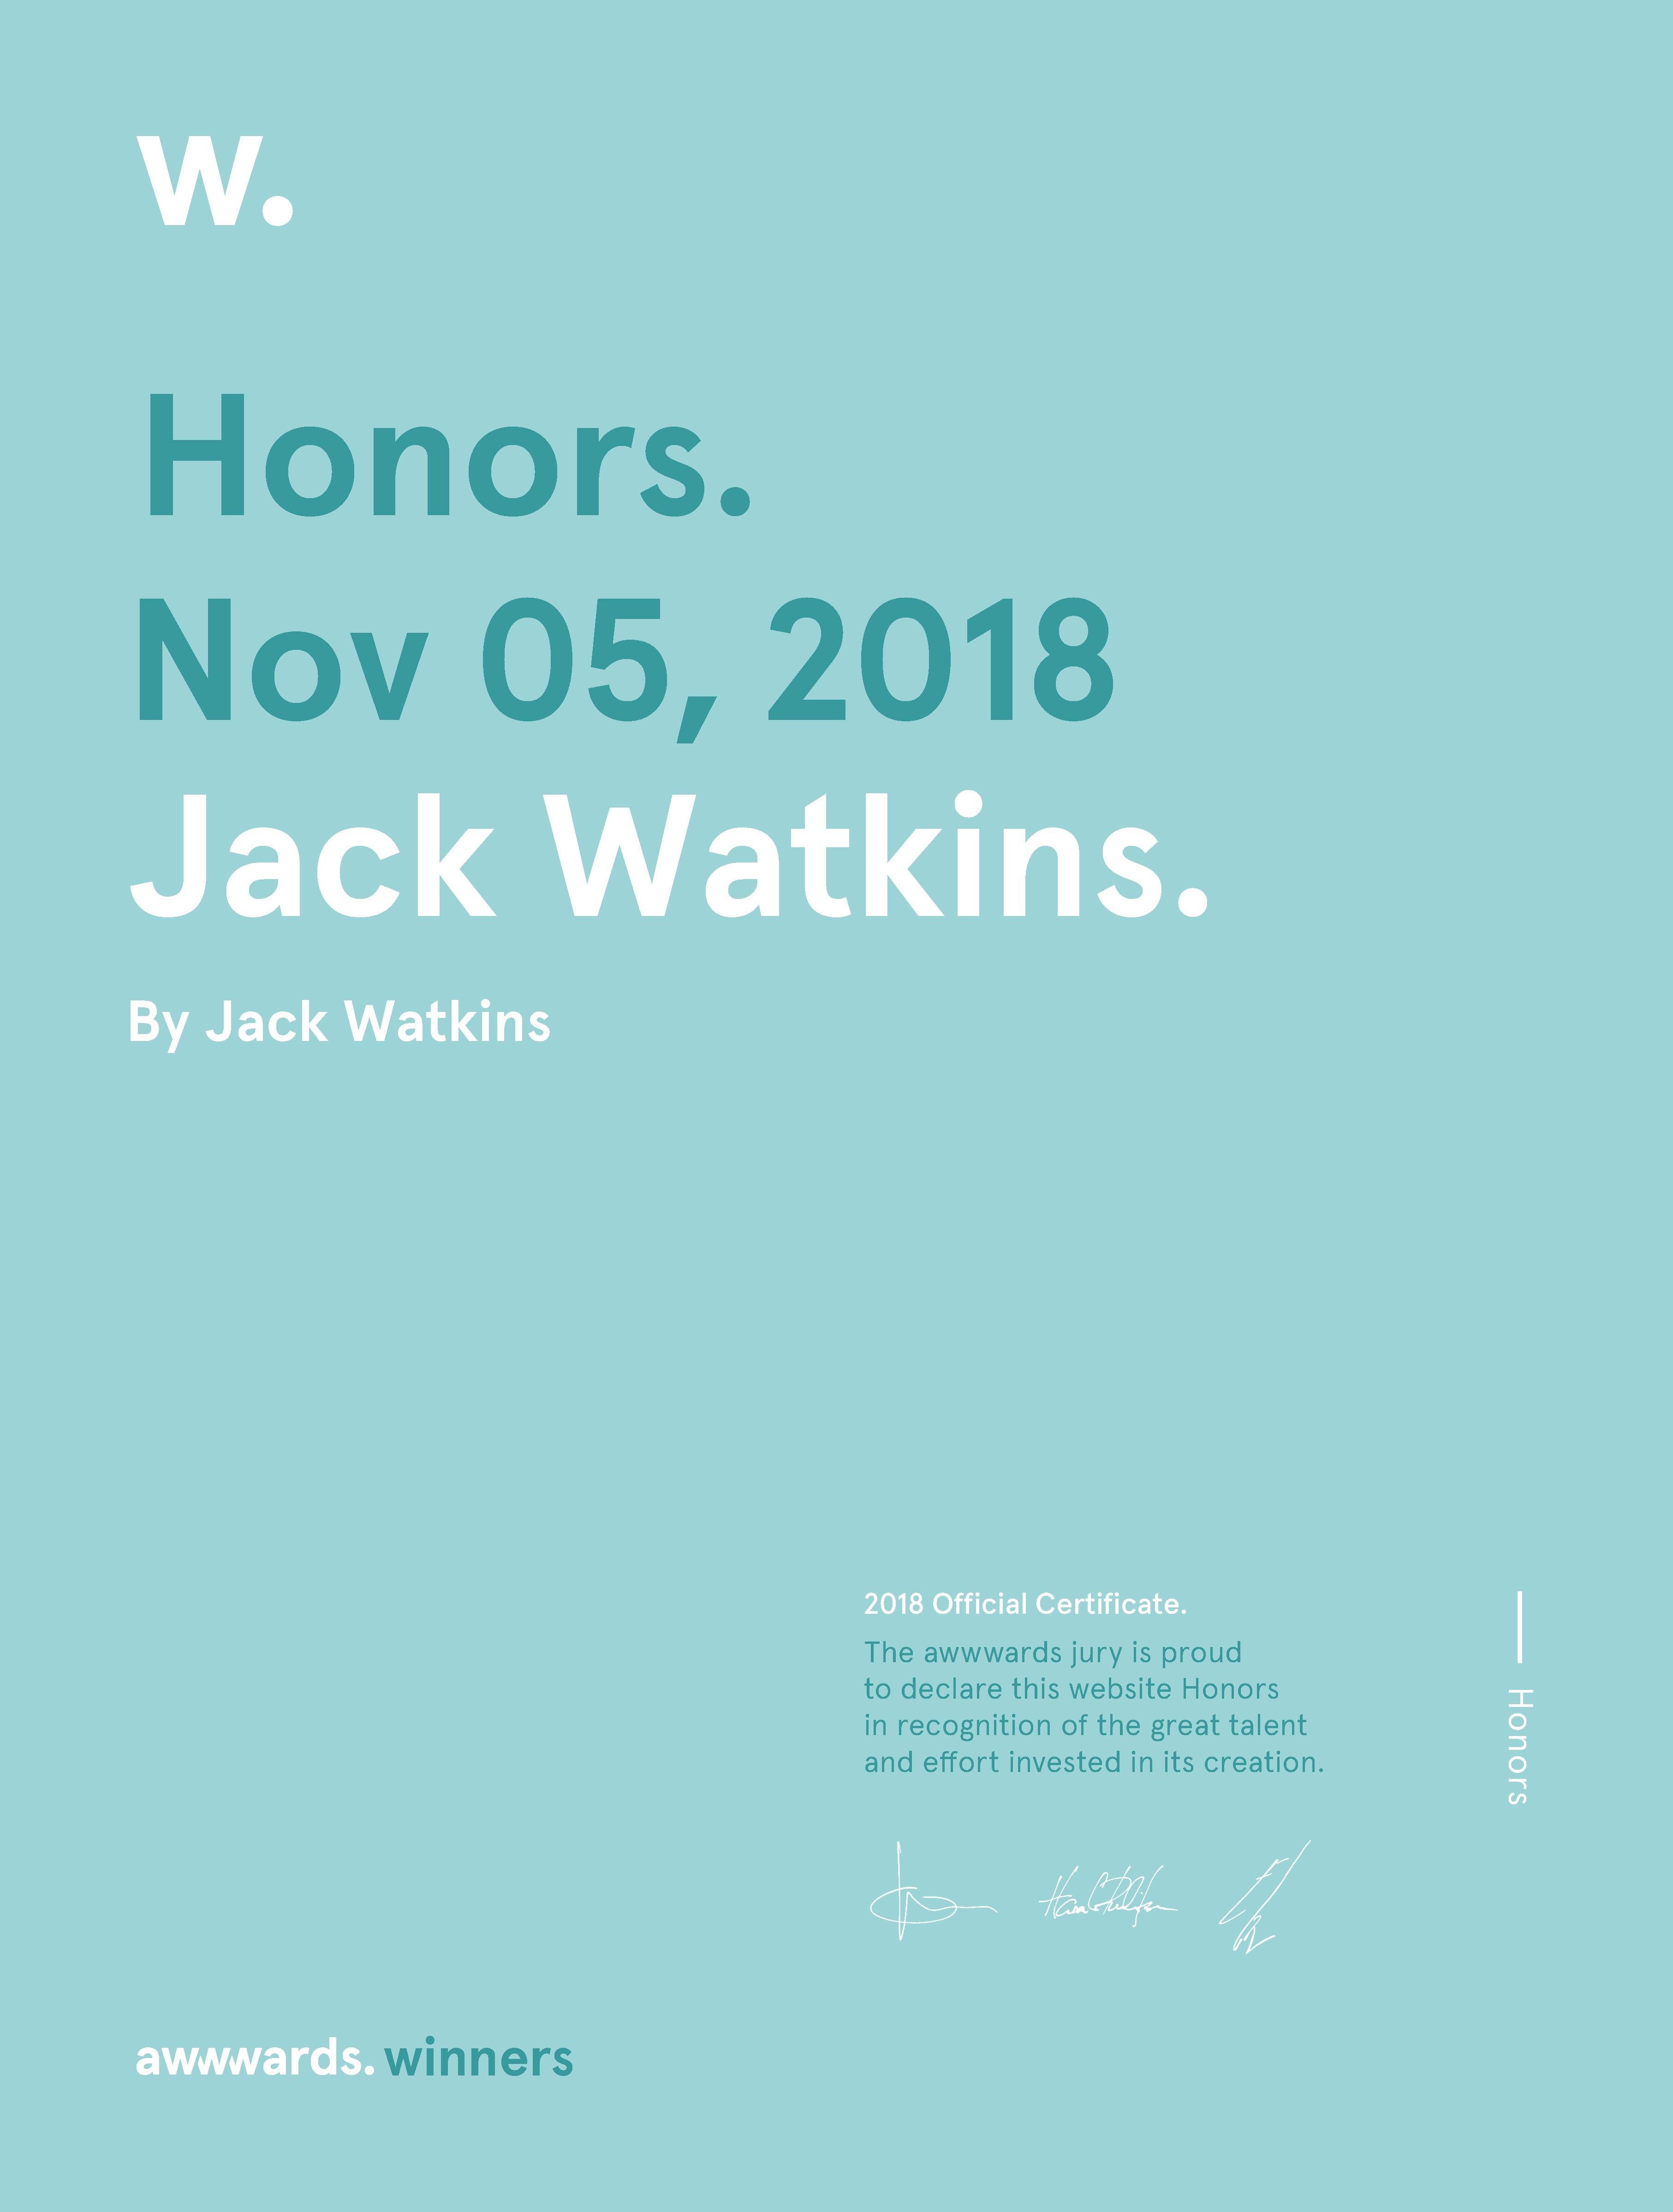 Jack Watkins Awwwards Honorable Mention